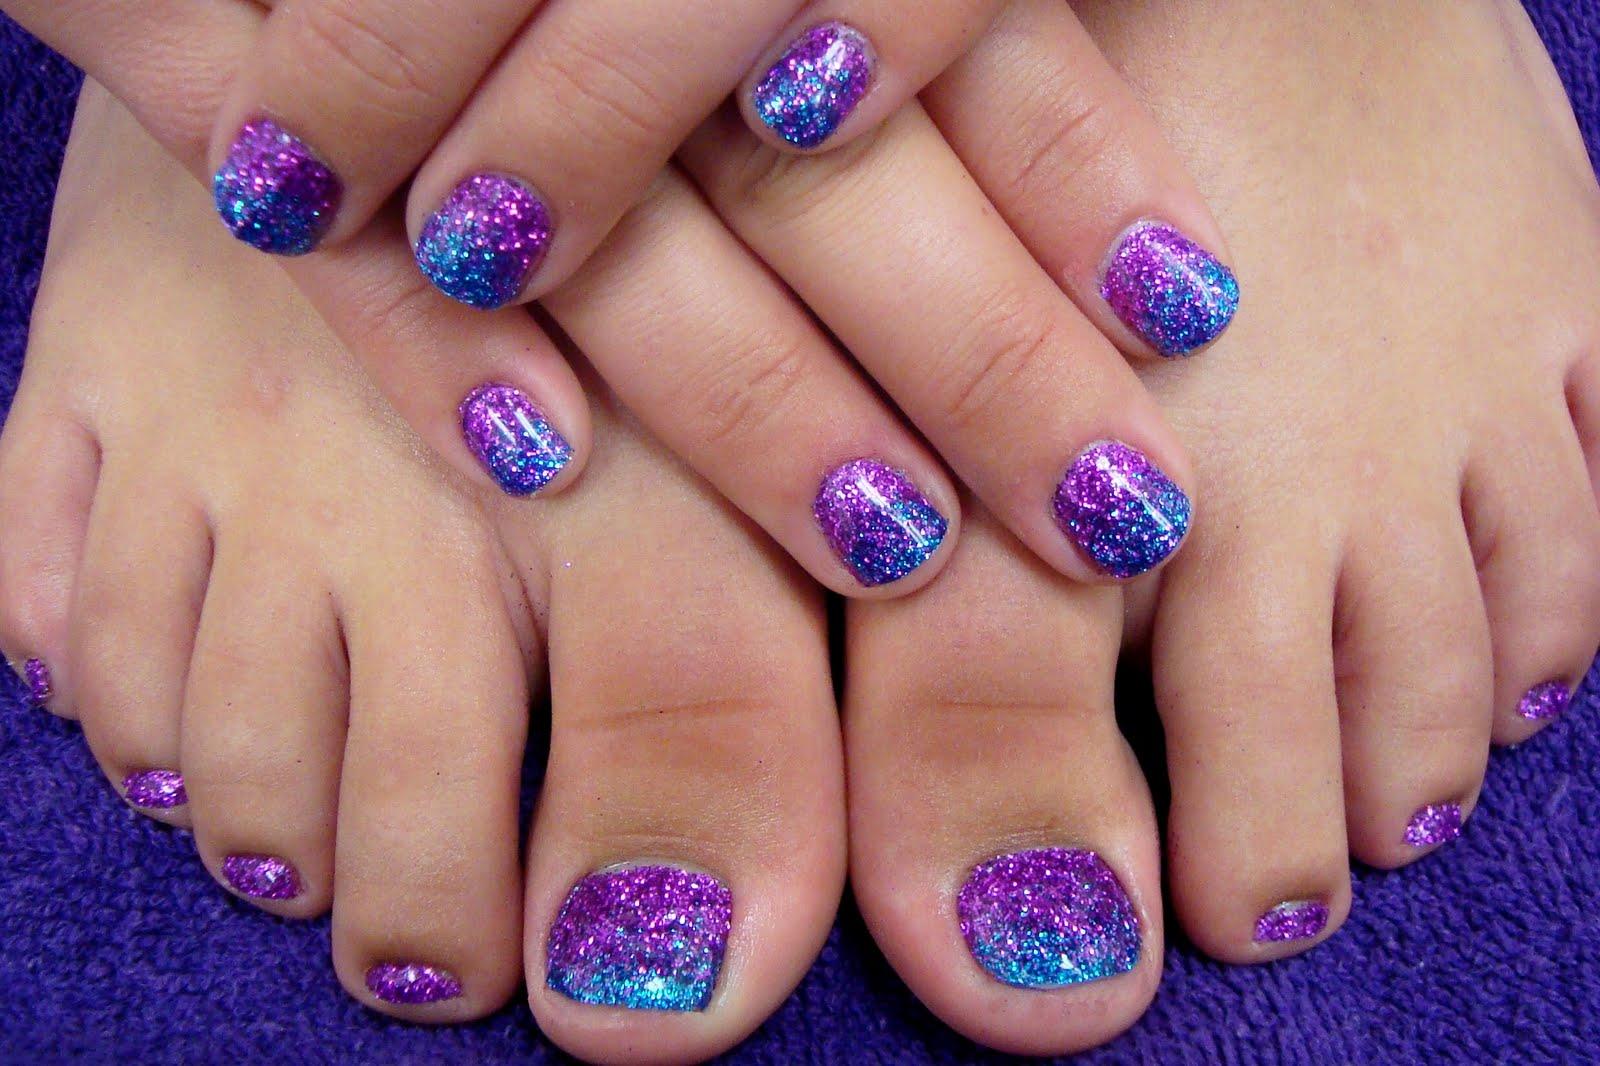 Purple Toenails Aboutwomanbeauty Com Nails Ideas